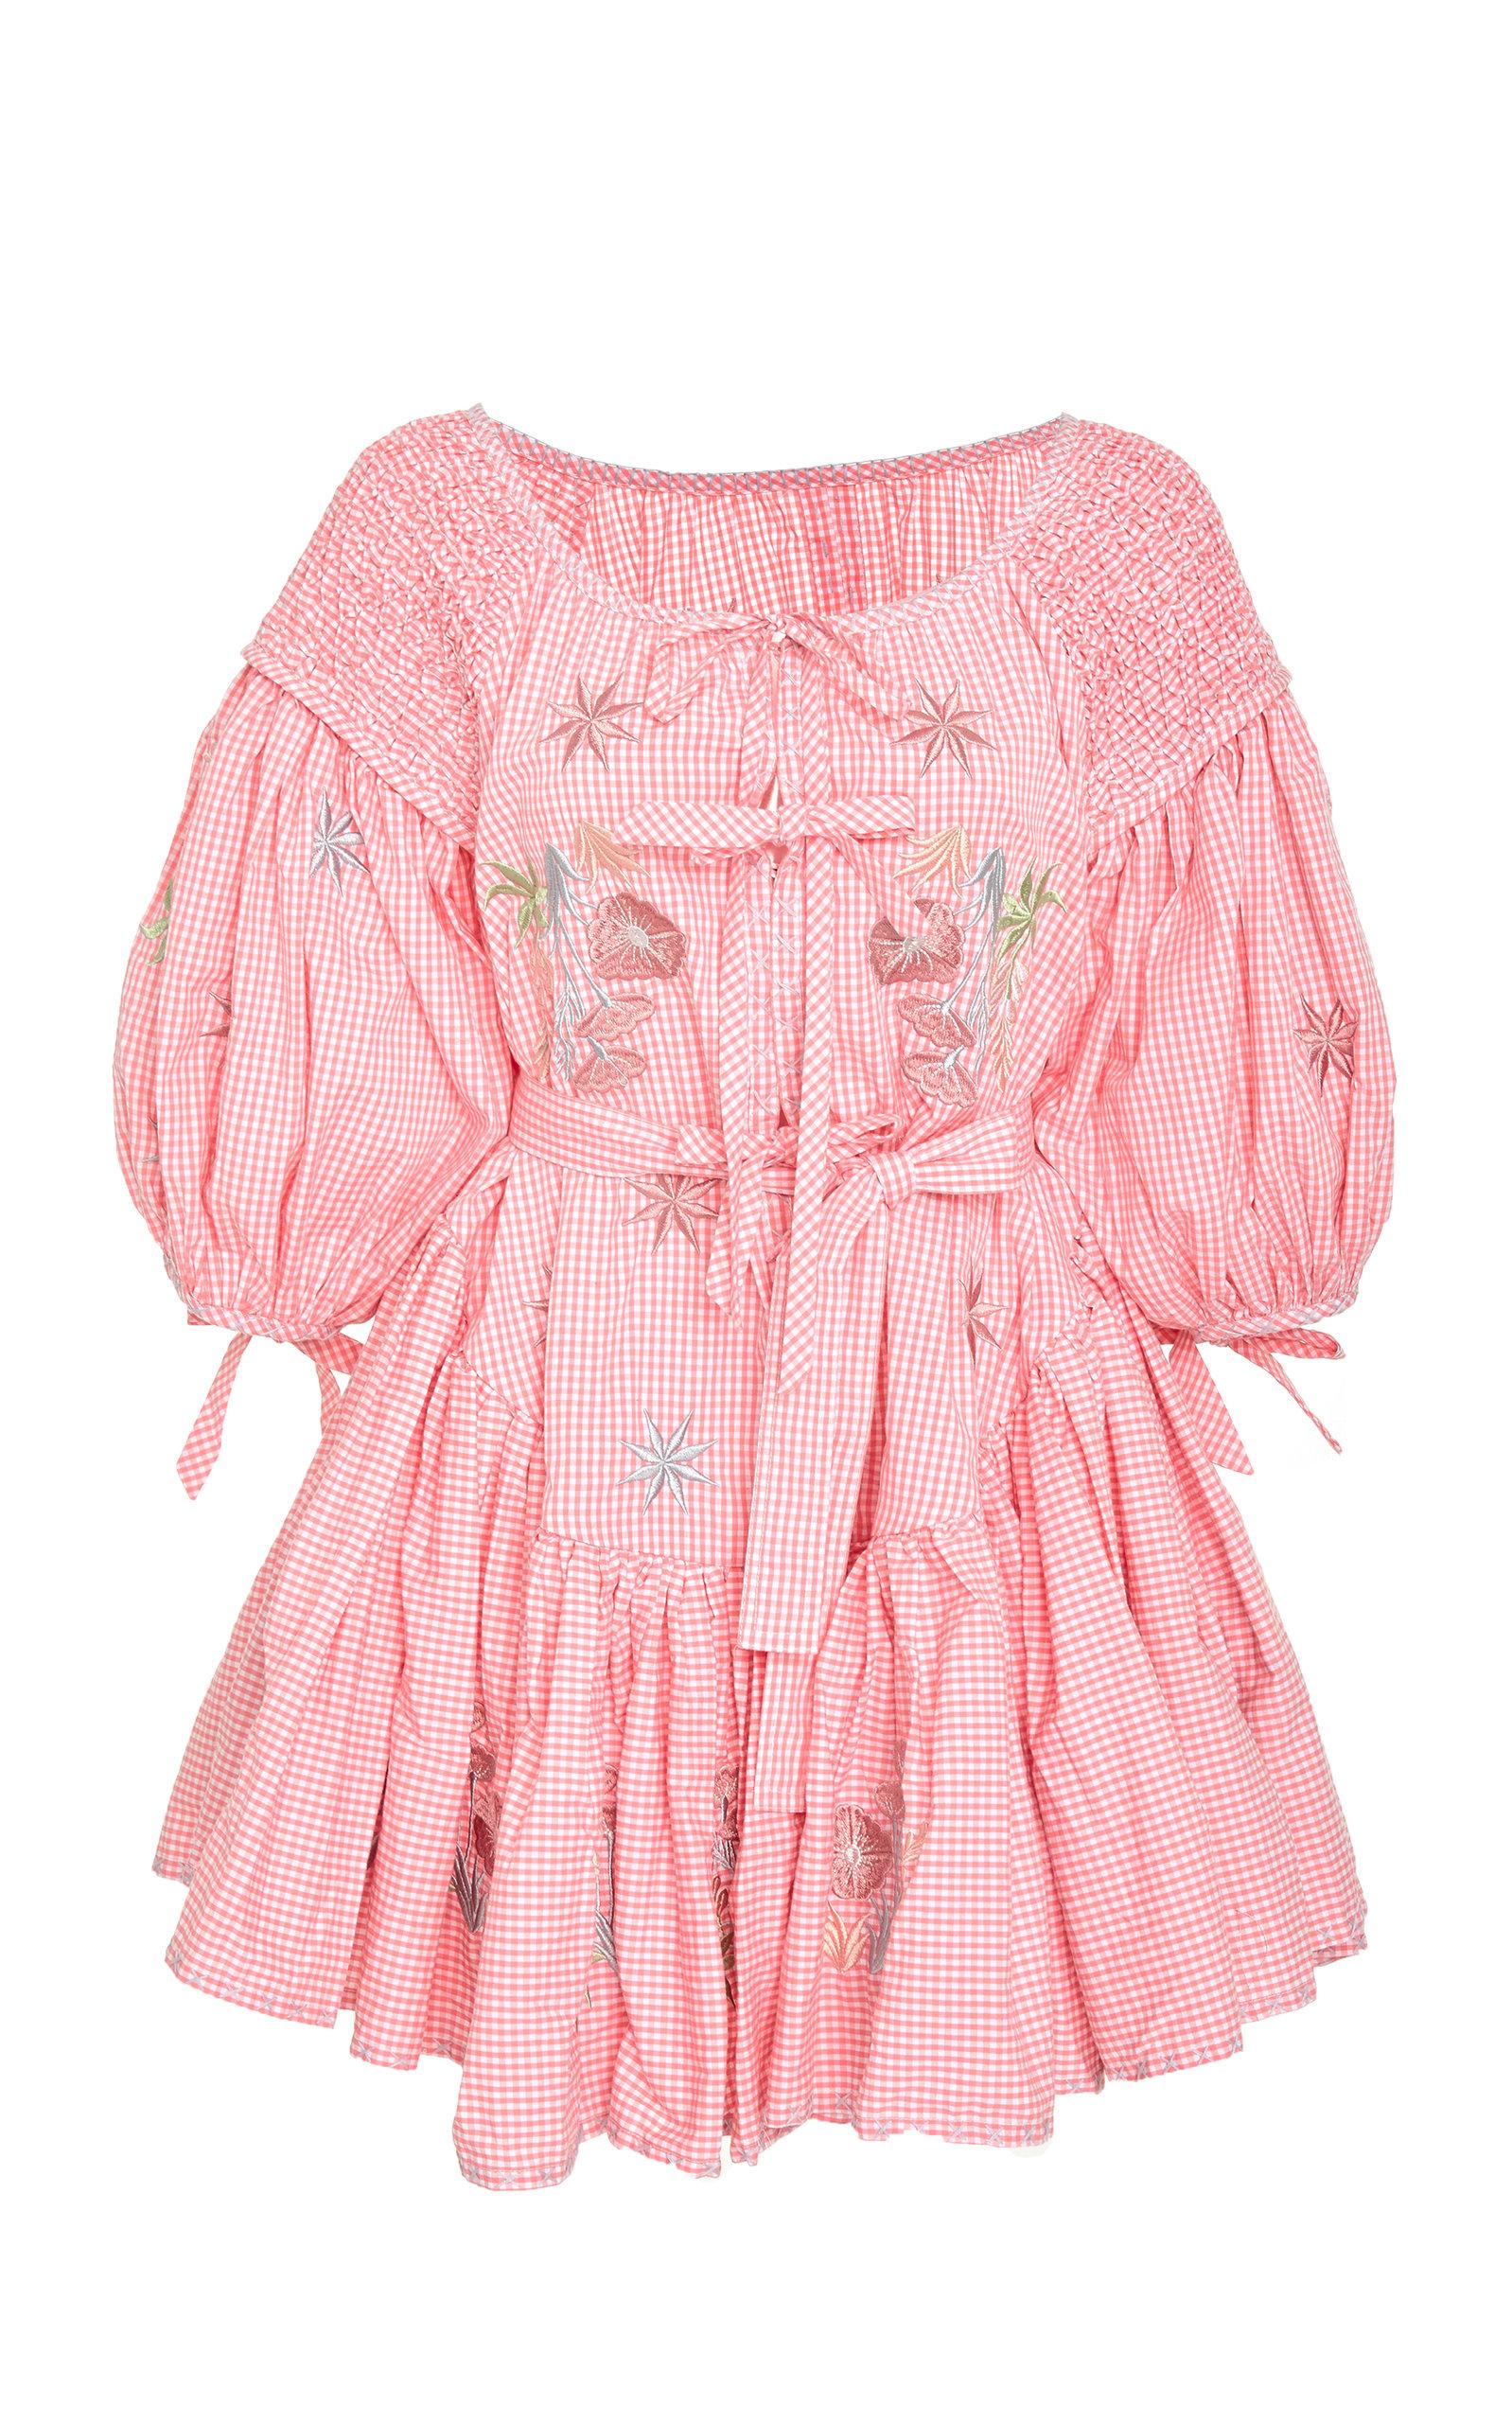 FRILL MINI SMOCKED DRESS